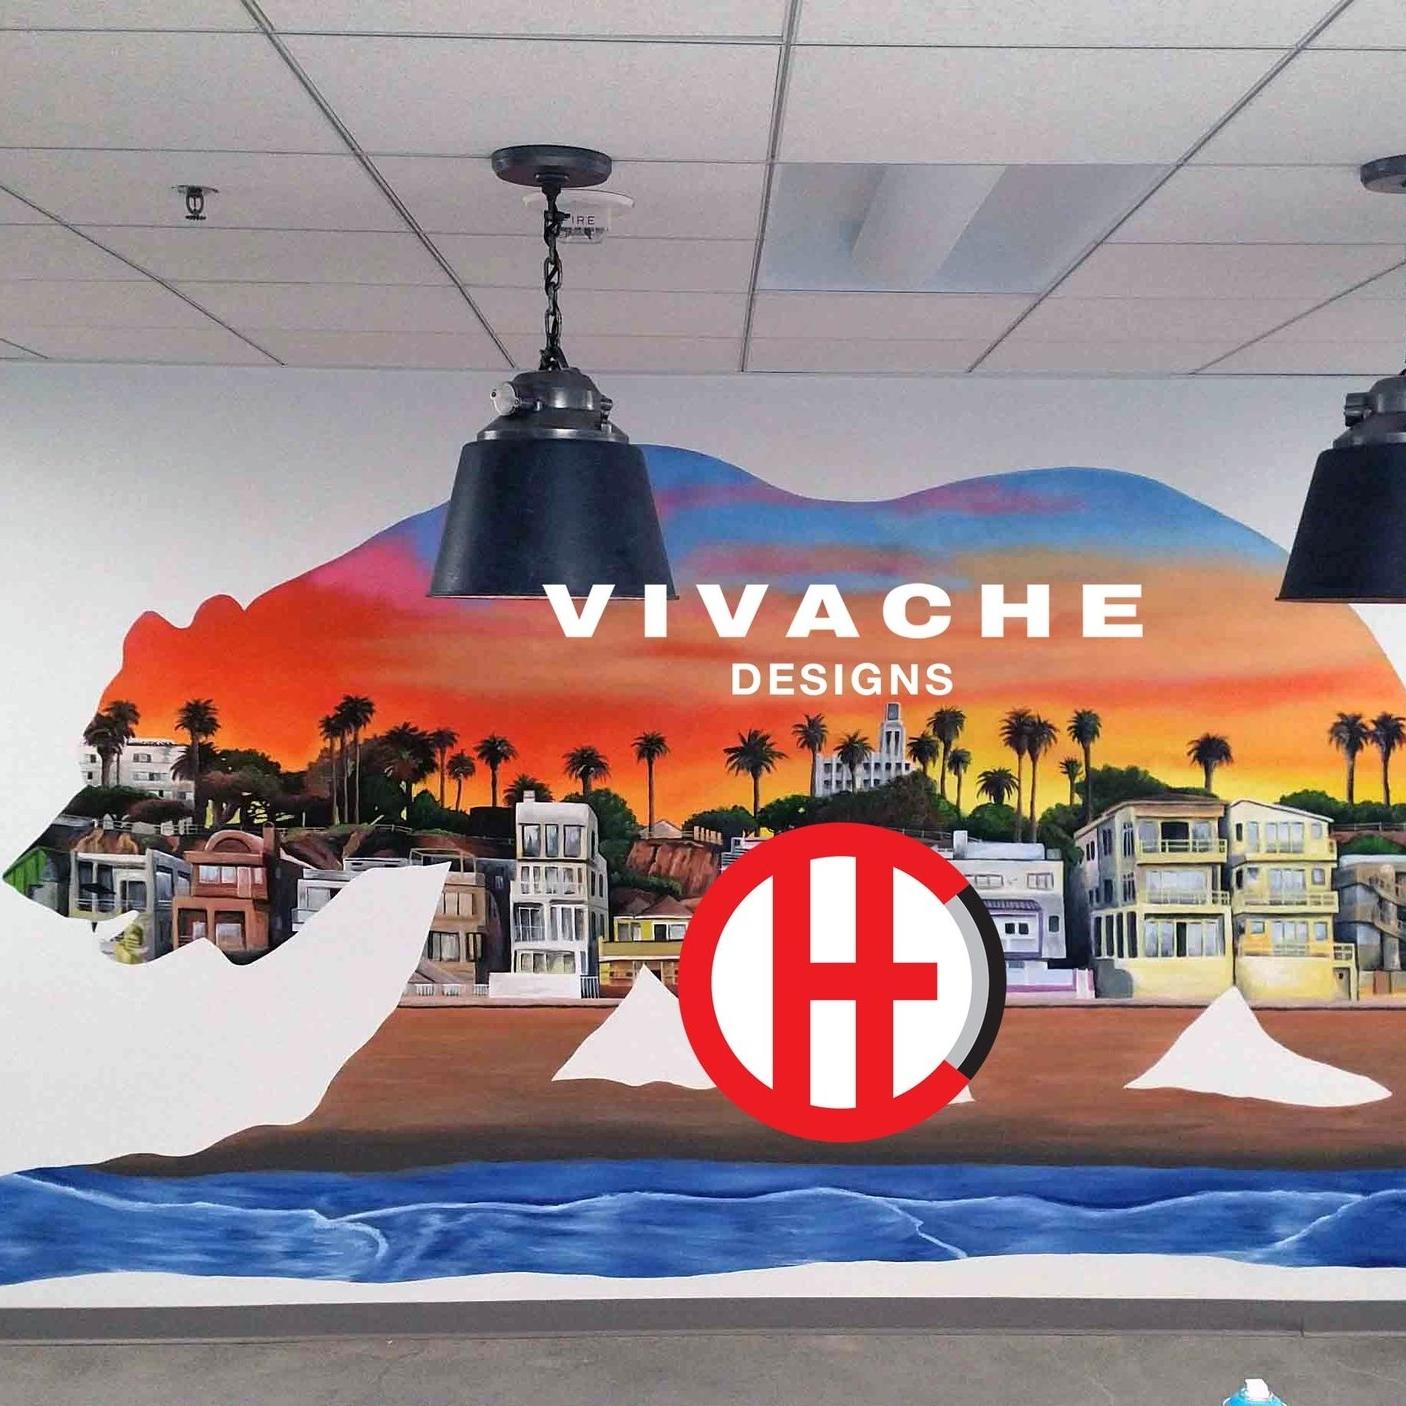 Vivache Designs Wall Murals copy.jpg